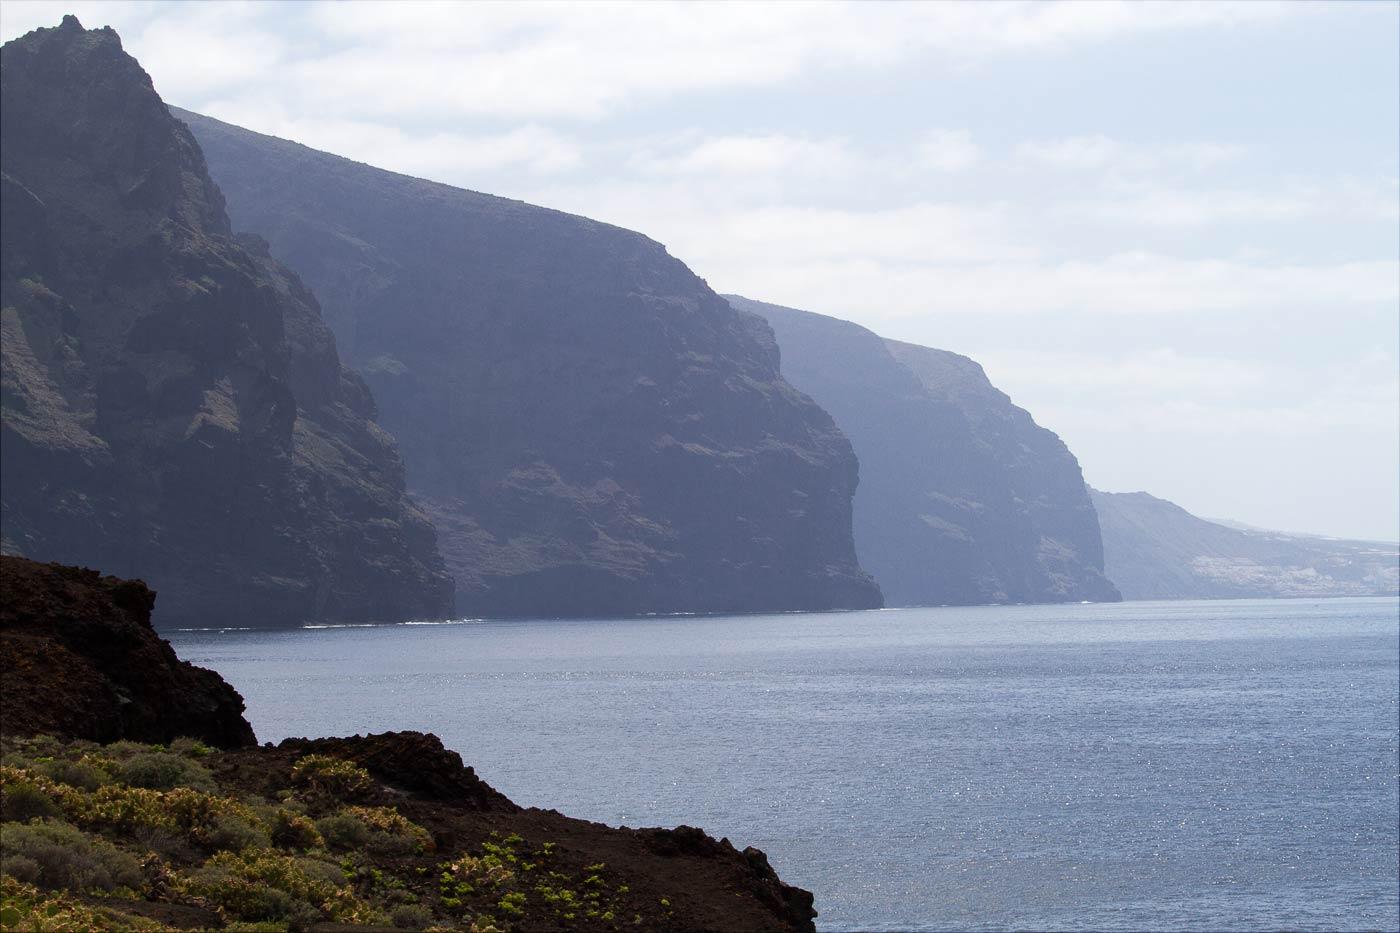 Скалы Лос-Гигантес на западном побережье Тенерифе